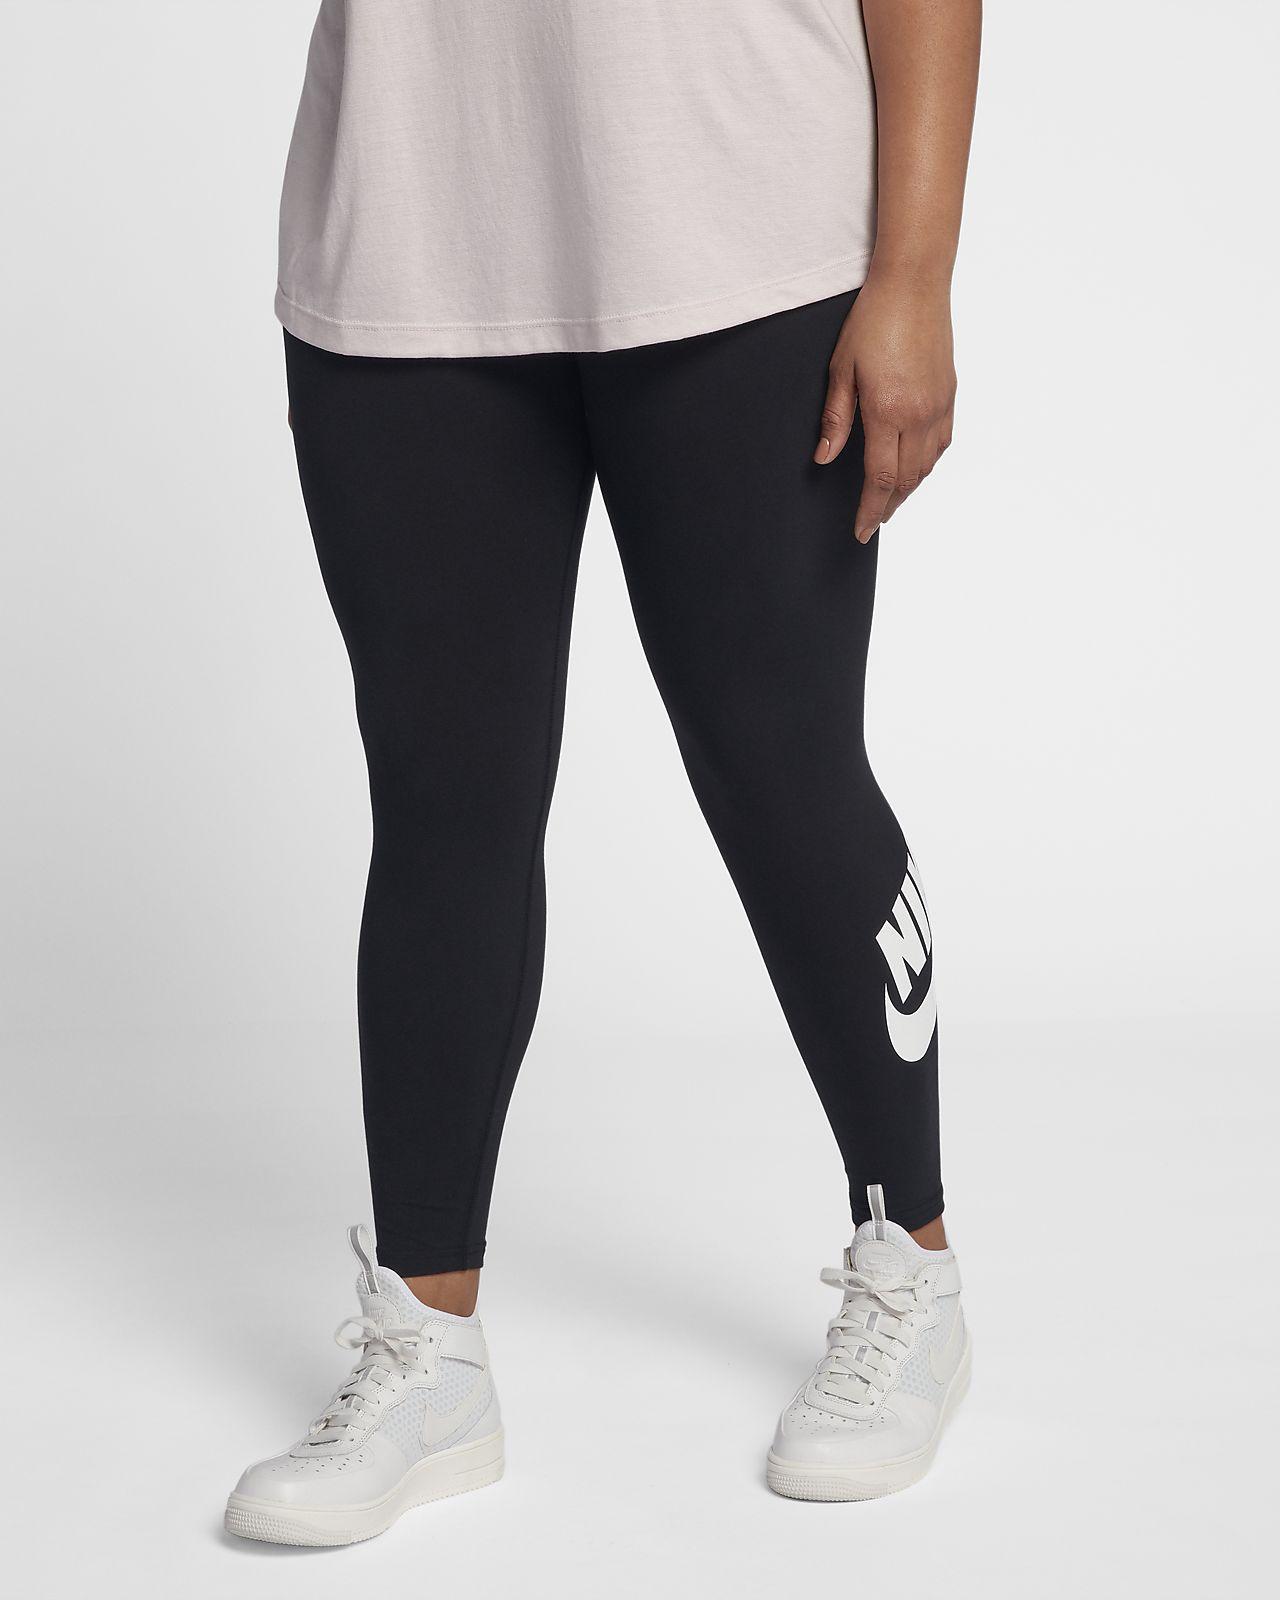 See Sportswear Mujer Leg Leggings Nike A Grande Para talla Z8xZnqPX